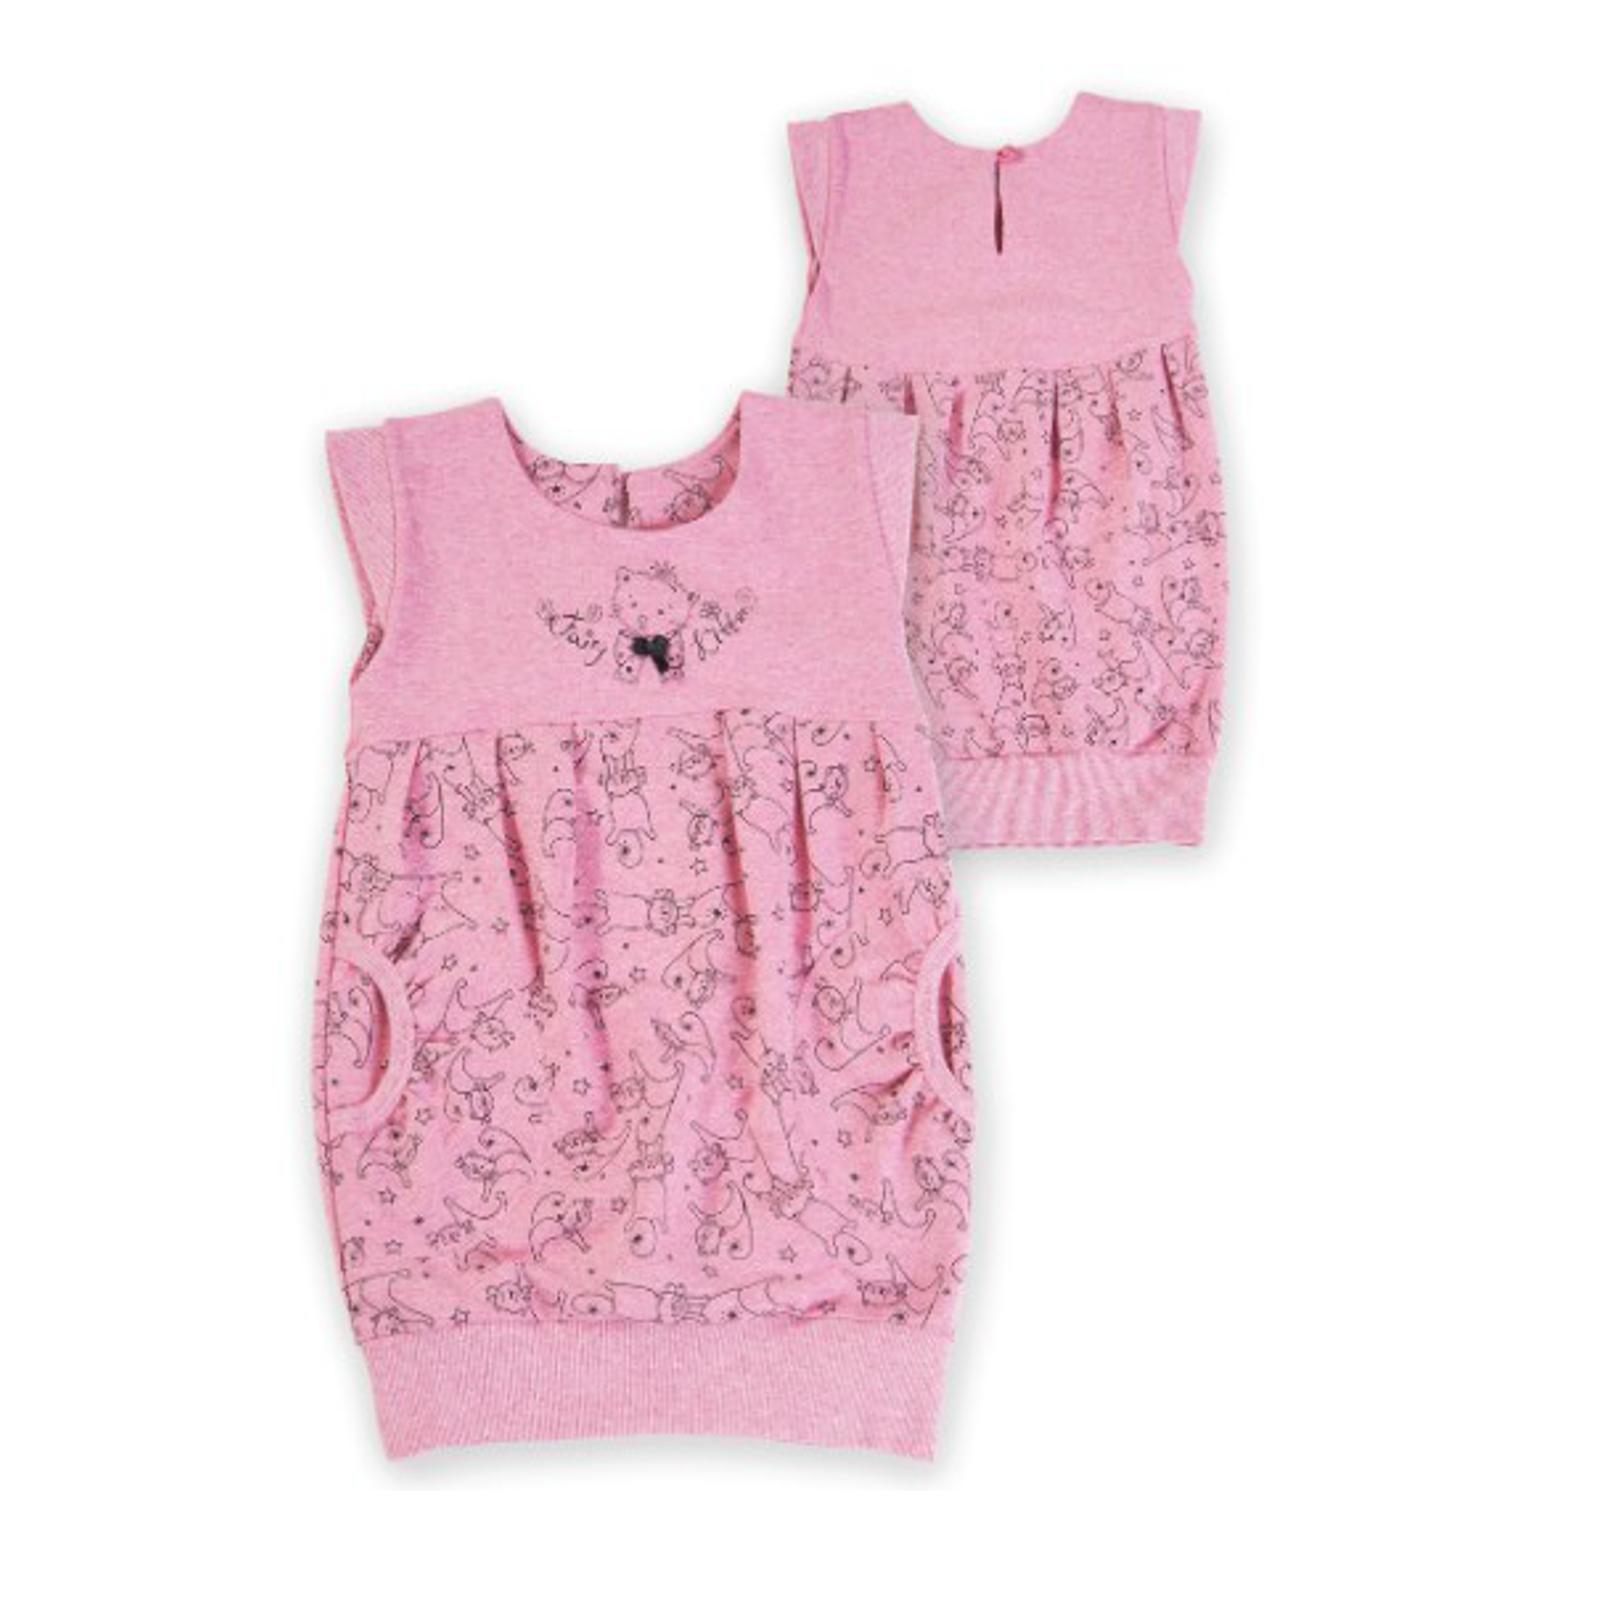 Сарафан-туника Soni Kids Cони Кидс Кошечка Фея, цвет розовый размер 98